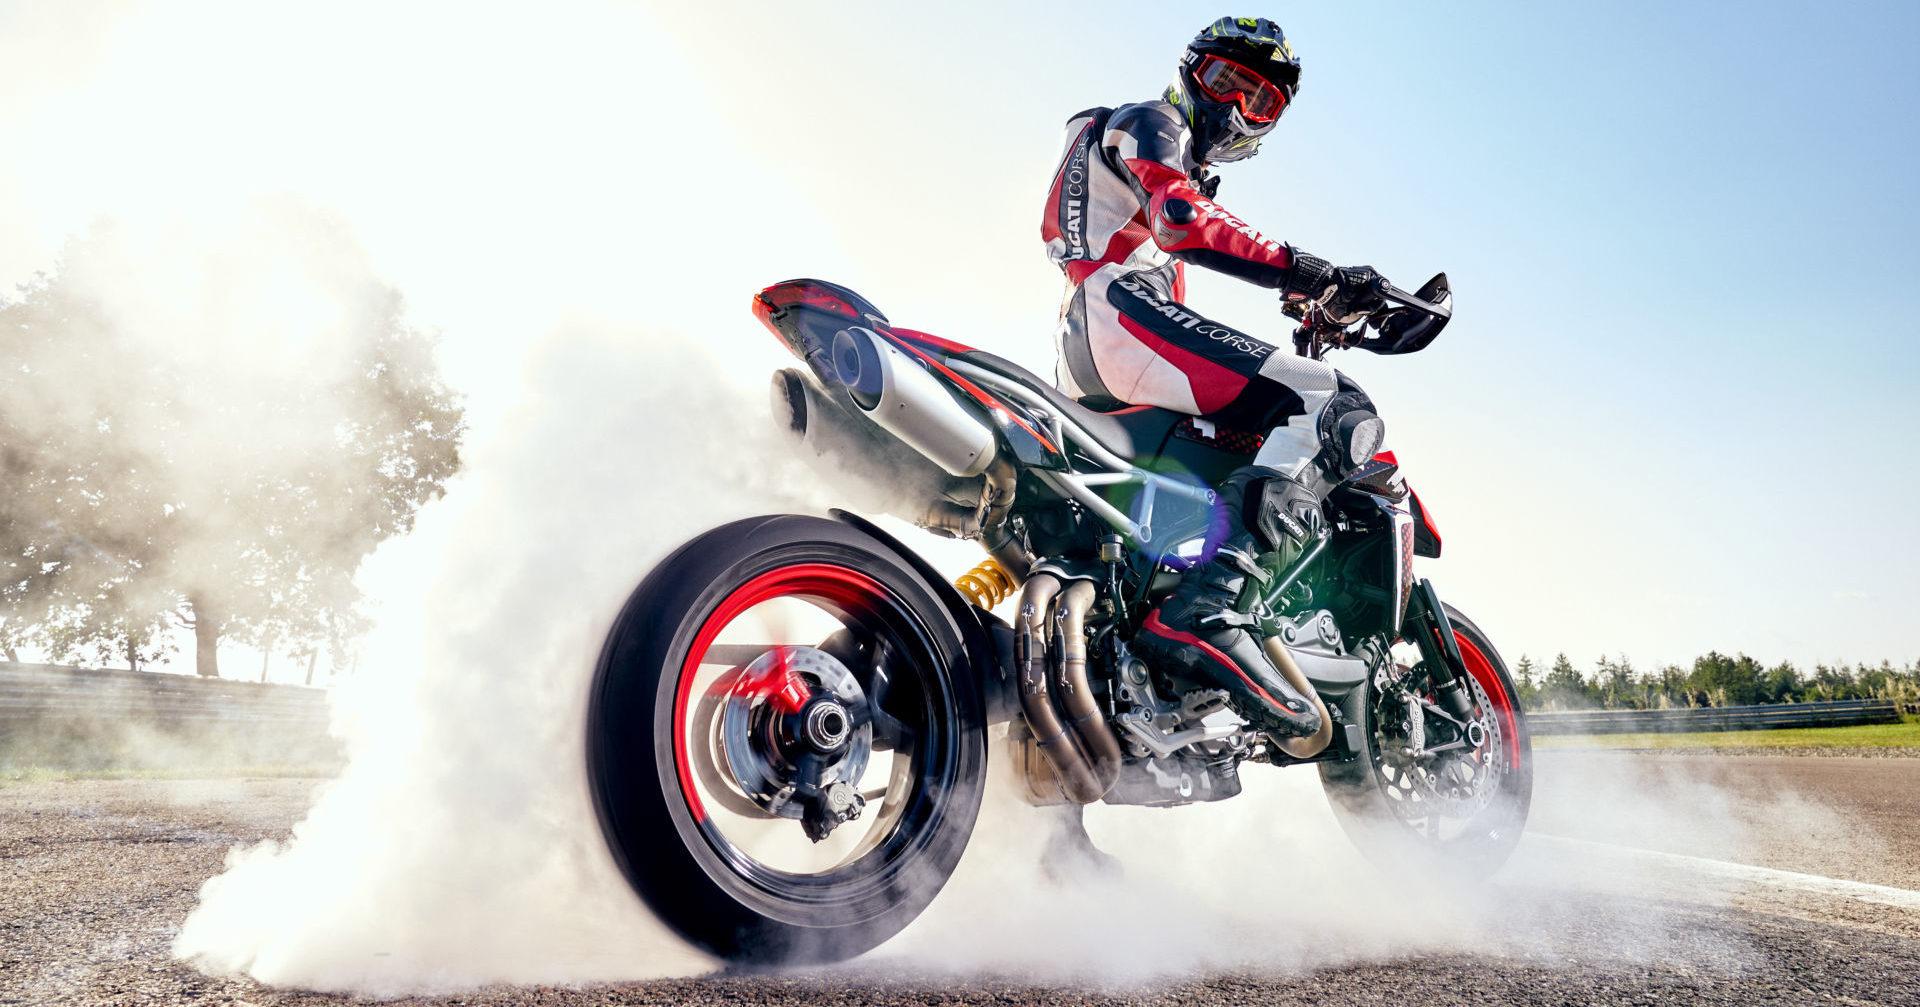 A Ducati Hypermotard 950 RVE in action. Photo courtesy Ducati.